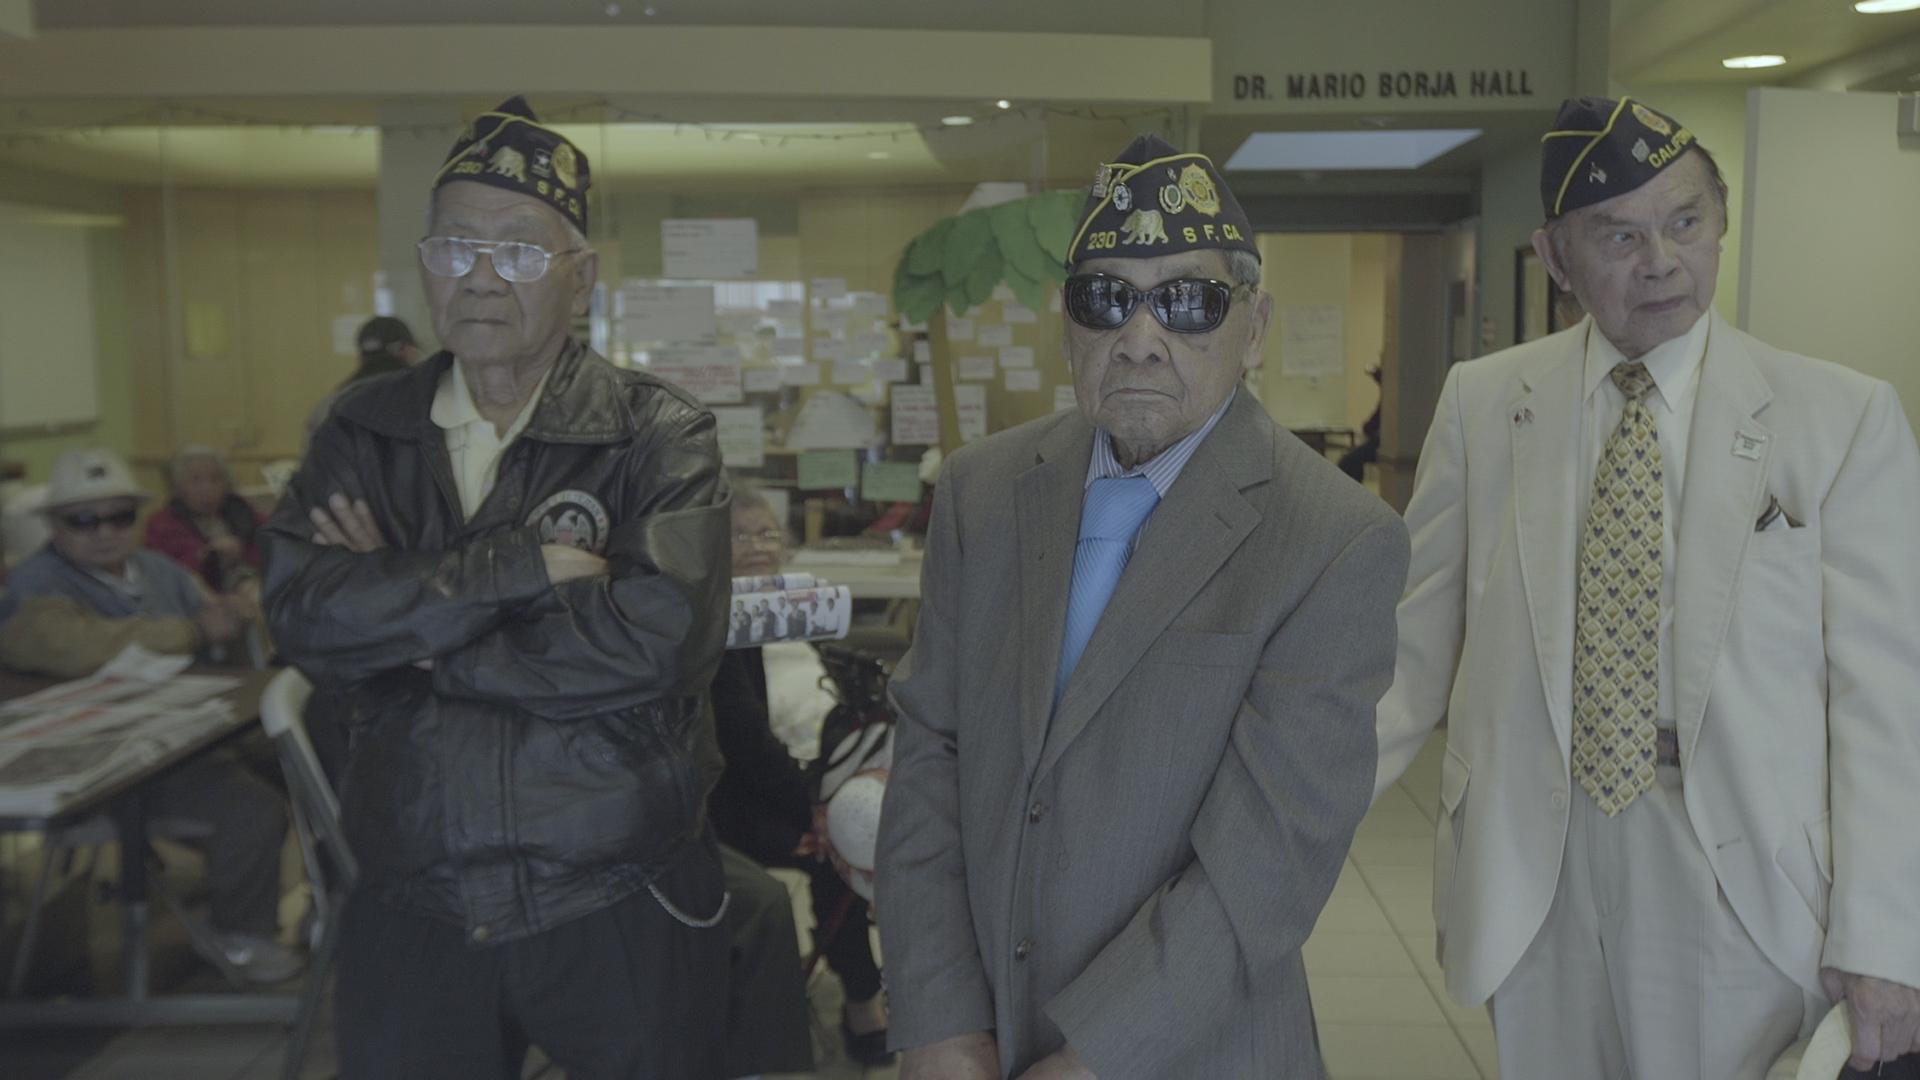 Three people stand wearing veteran hats